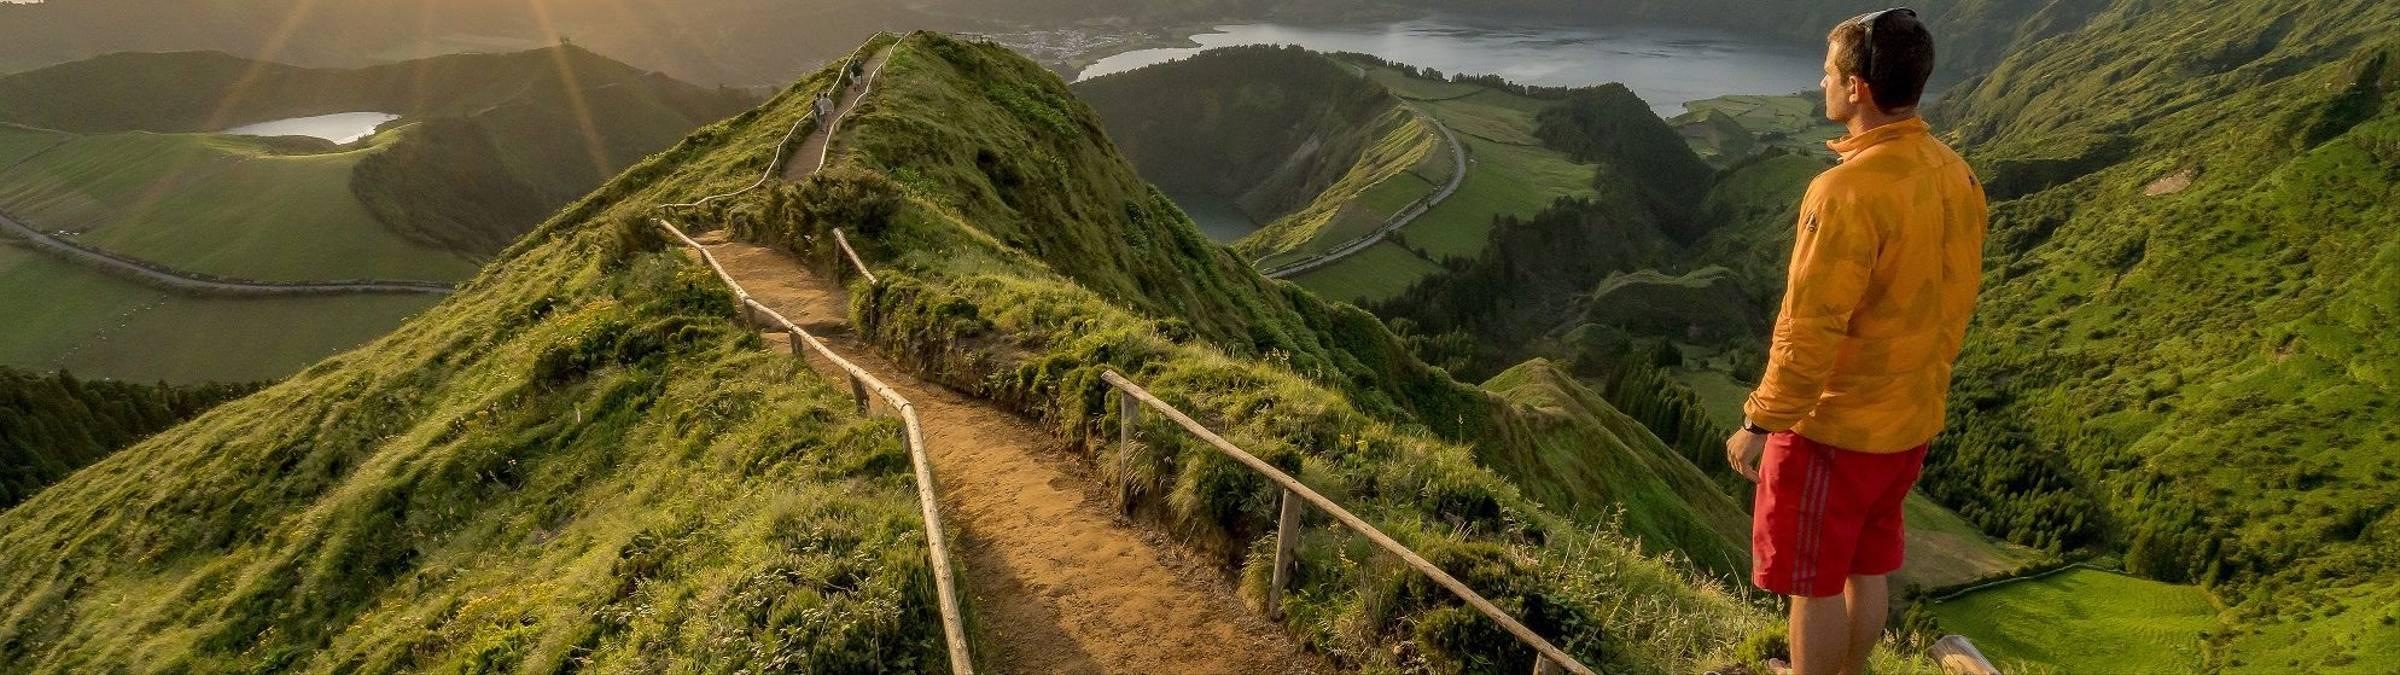 RESIZED Grota do Inferno Viewpoint Credit Tristan Shu & Turismo dos Açores